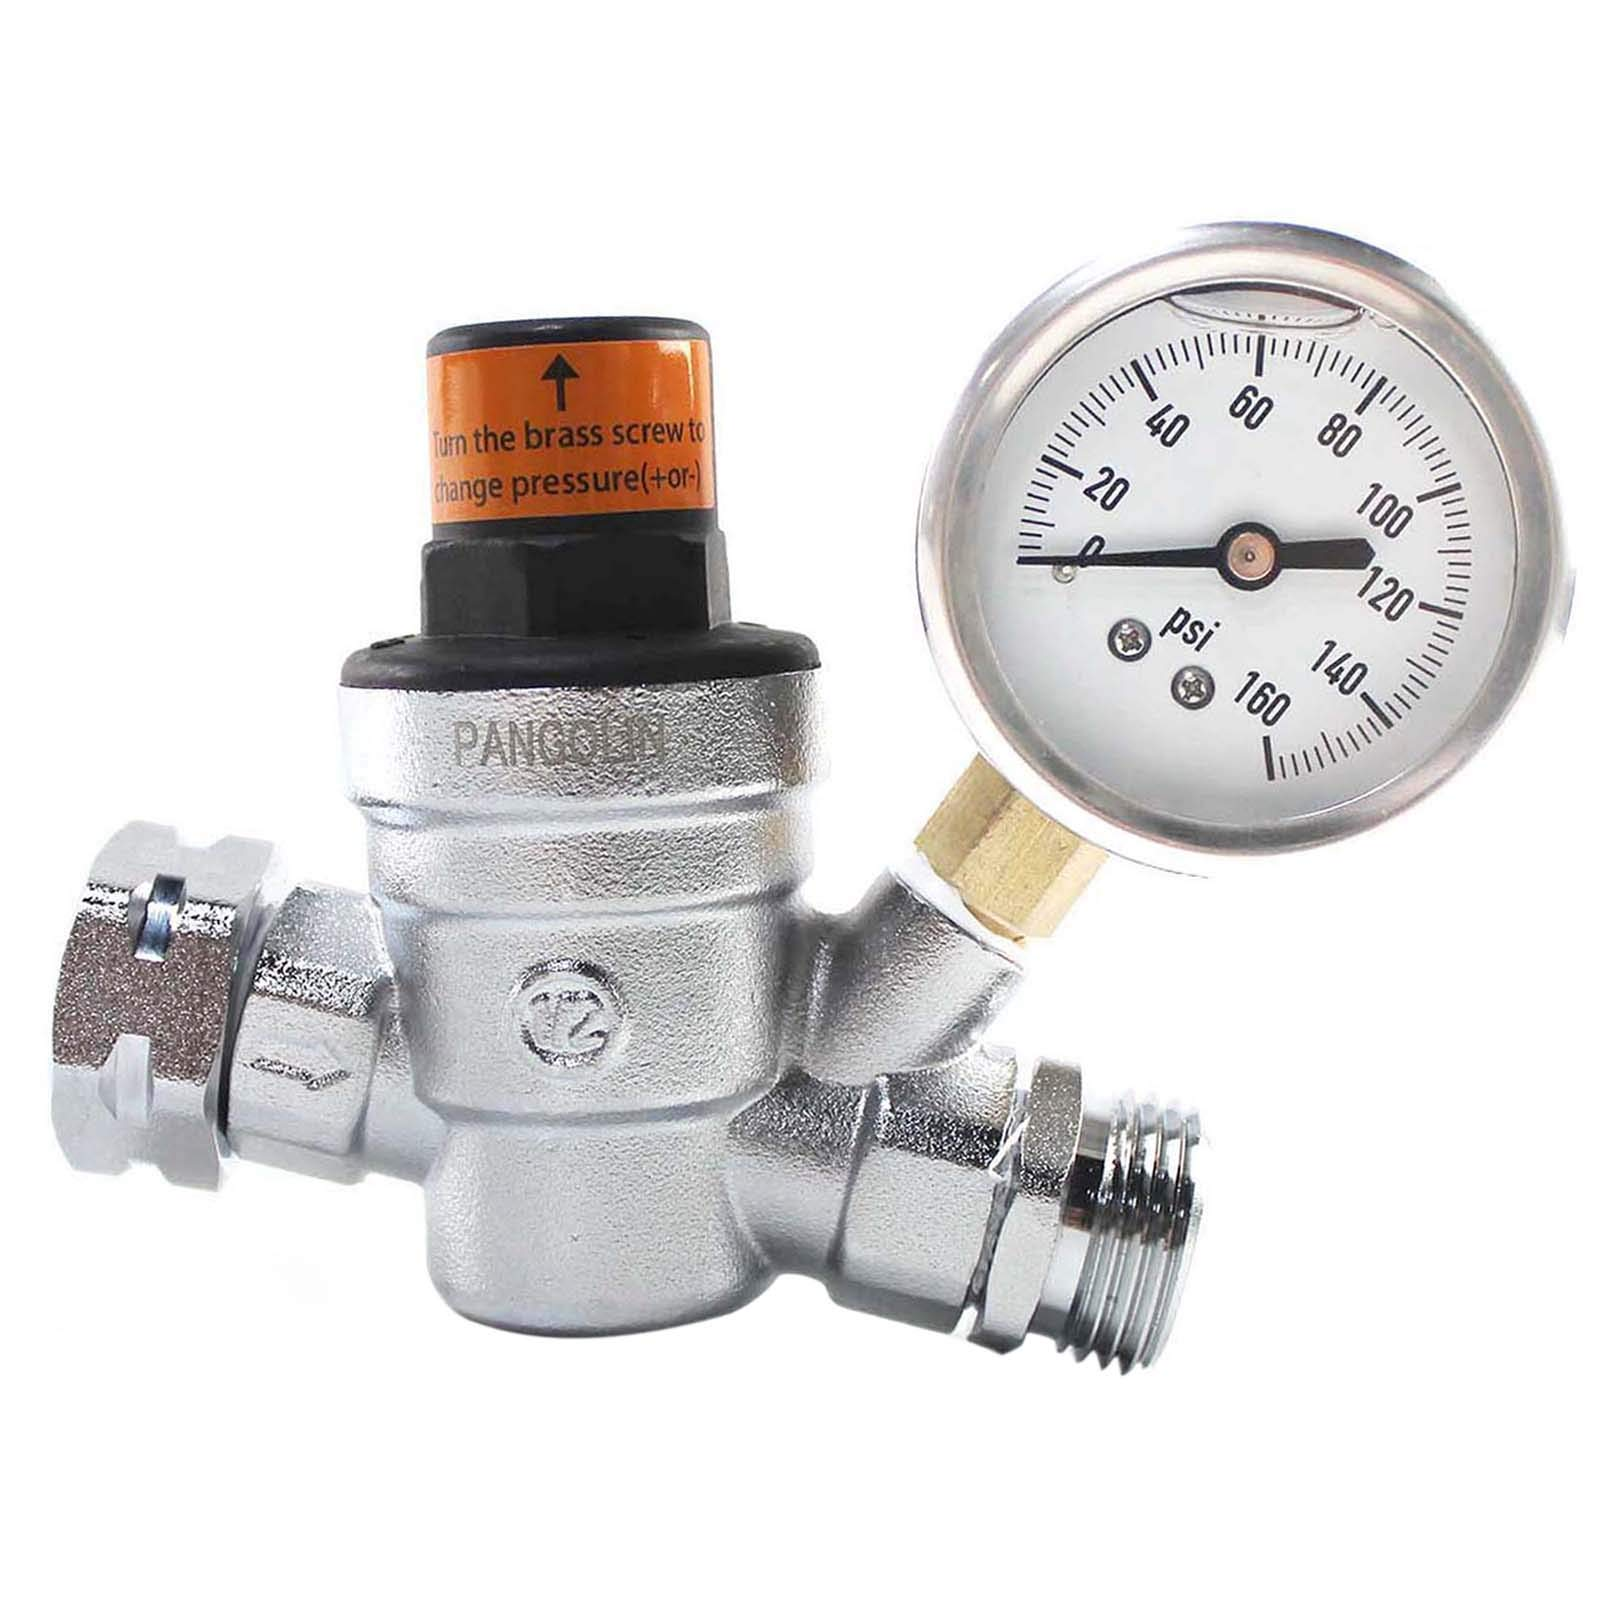 "PANGOLIN Water Pressure Regulator Valve with 160 PSI Gauge and Inlet Stainless Screened Filter RV Regulator Valve, 3/4"" NH Lead-Free Brass Adjustable Pressure Regulator for RV Camper, 2 Years Warranty"